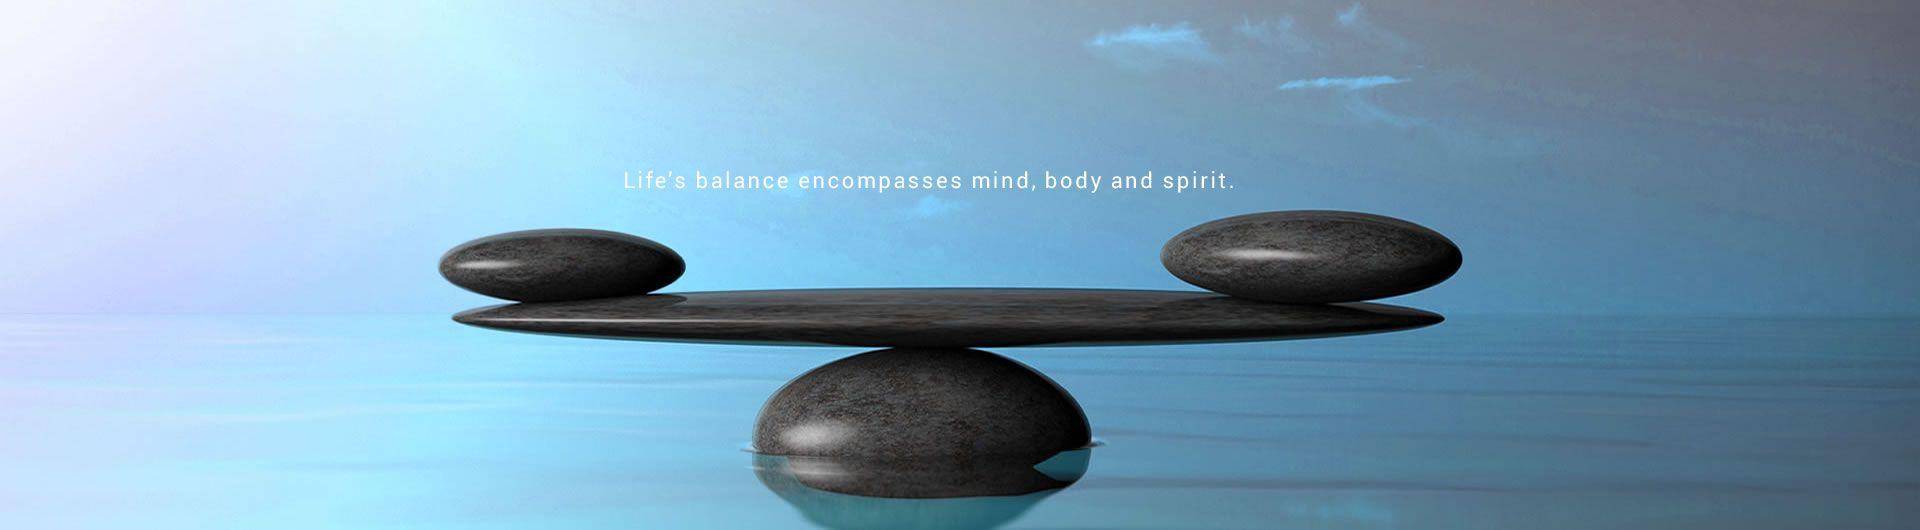 balancing stones on blue background